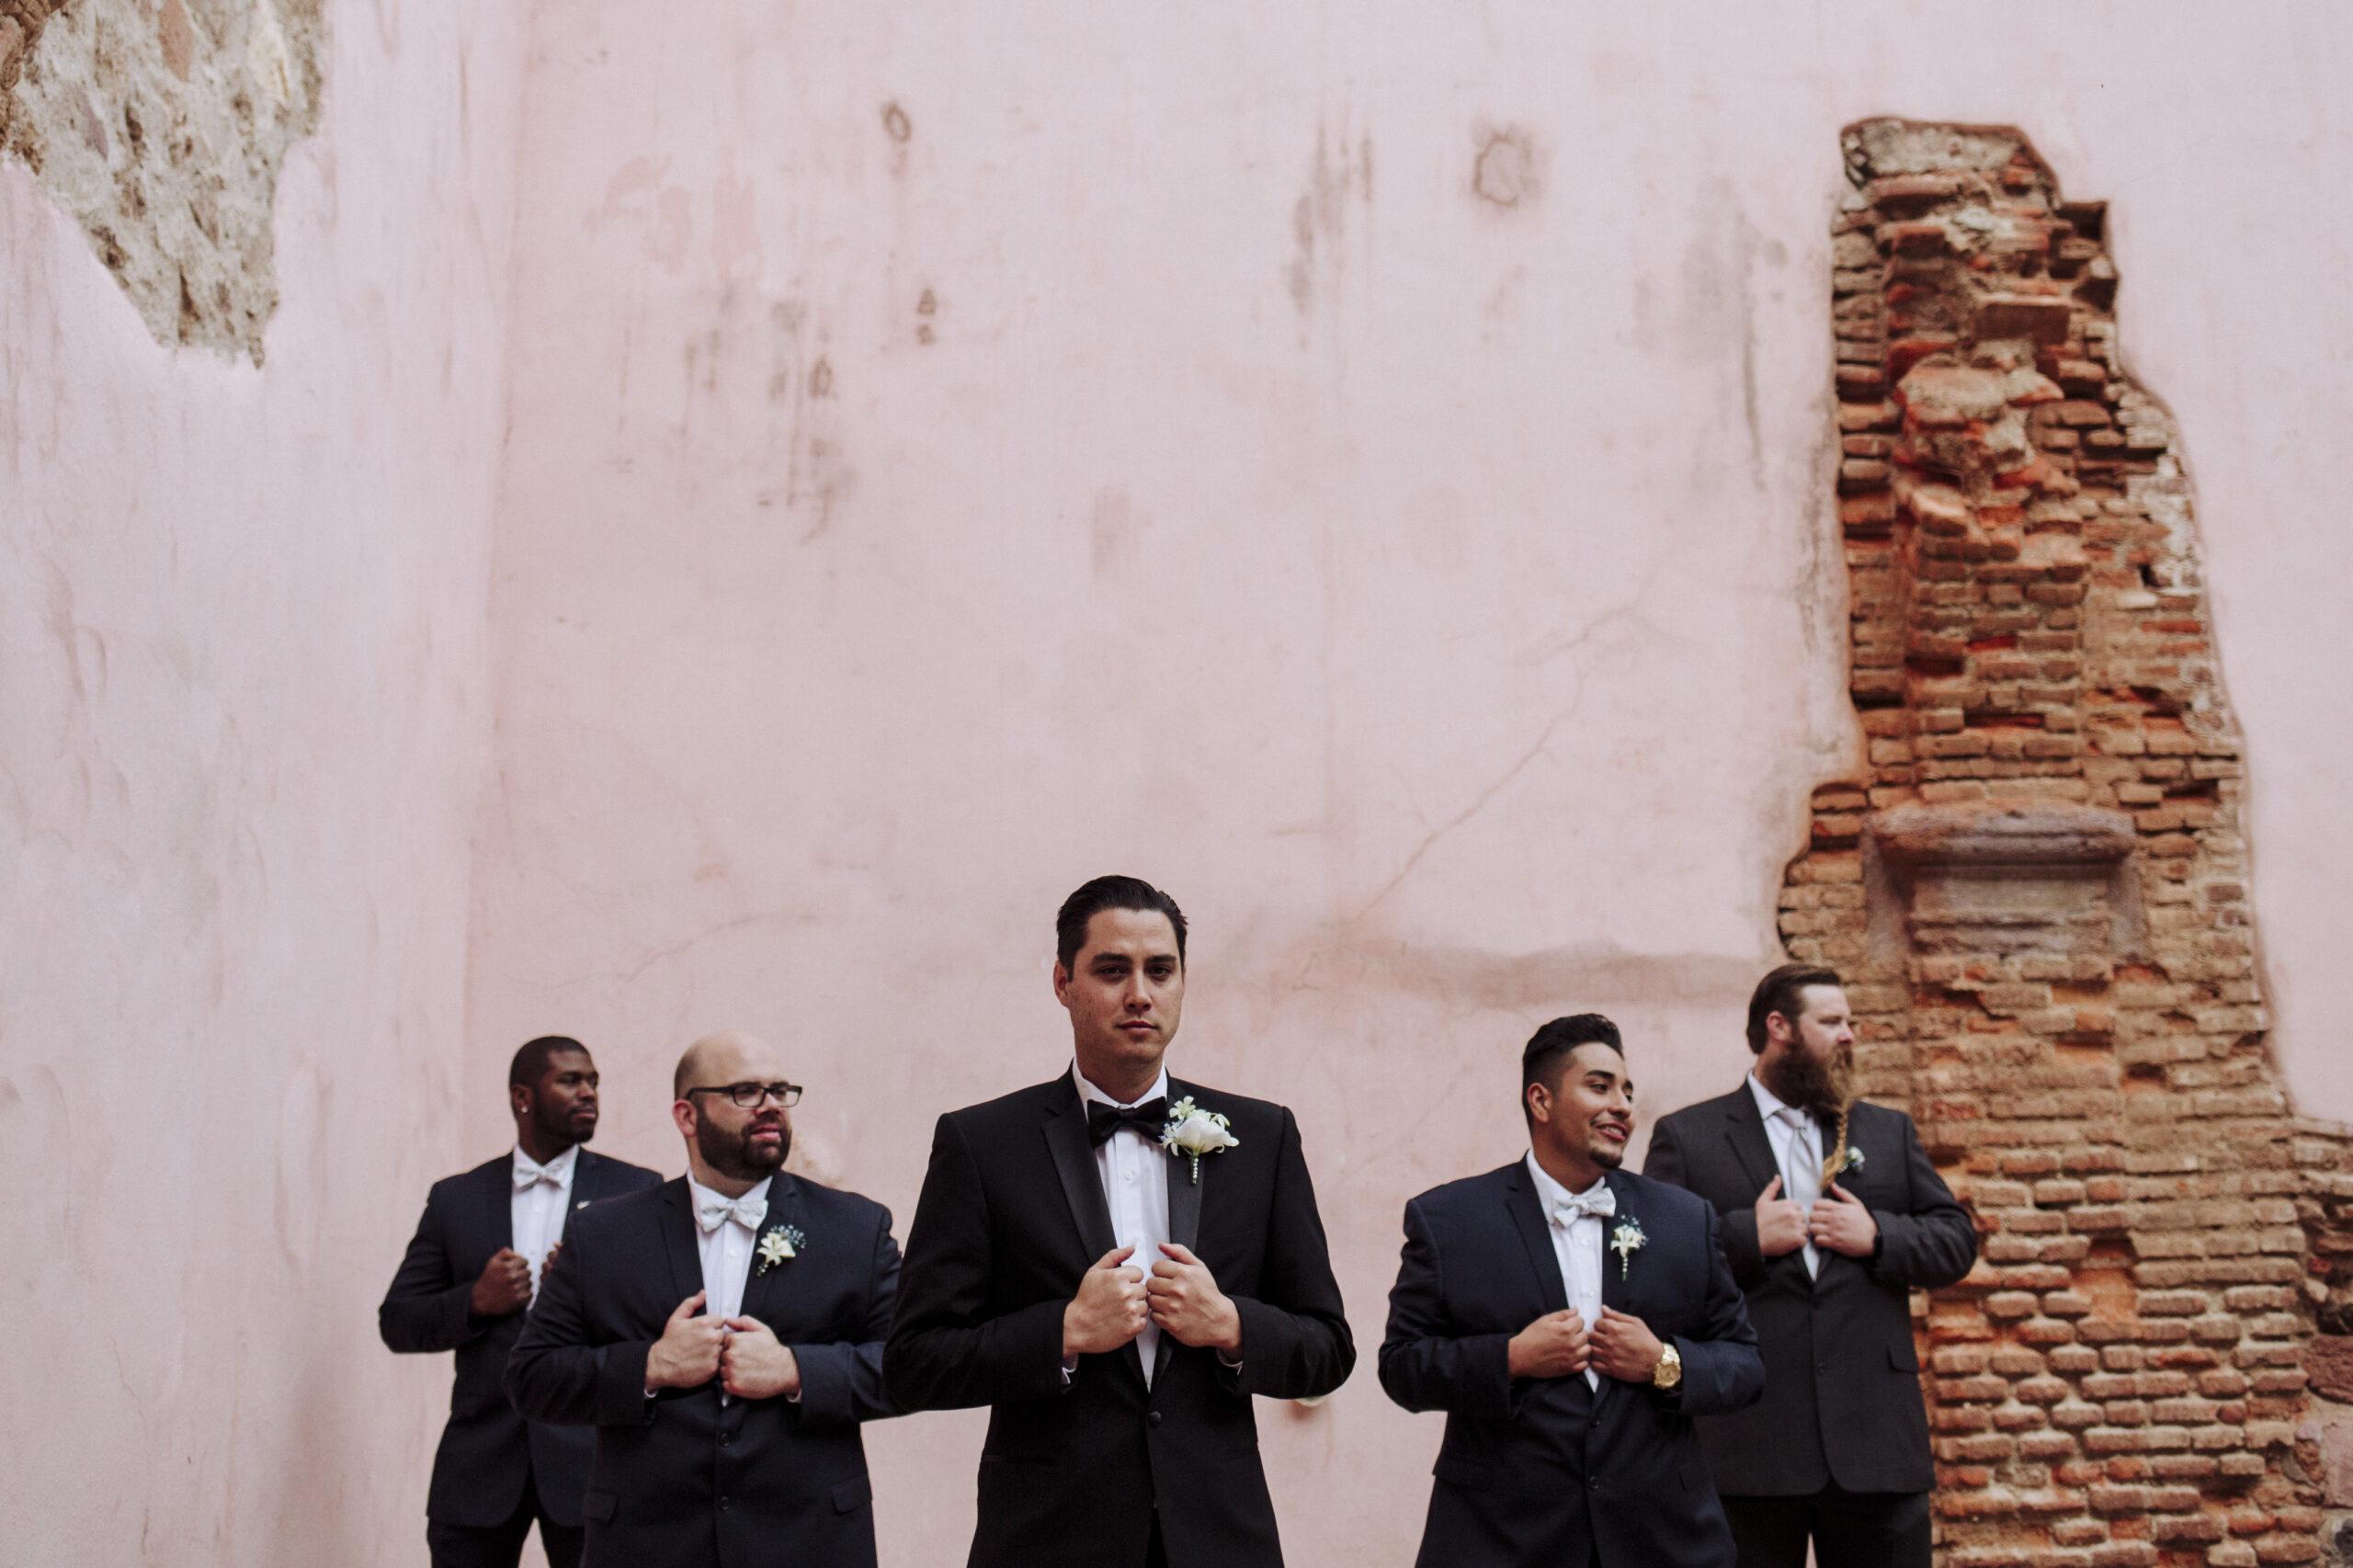 javier_noriega_fotografo_profesional_bodas_zacatecas_mexico_chihuahua_photographer36